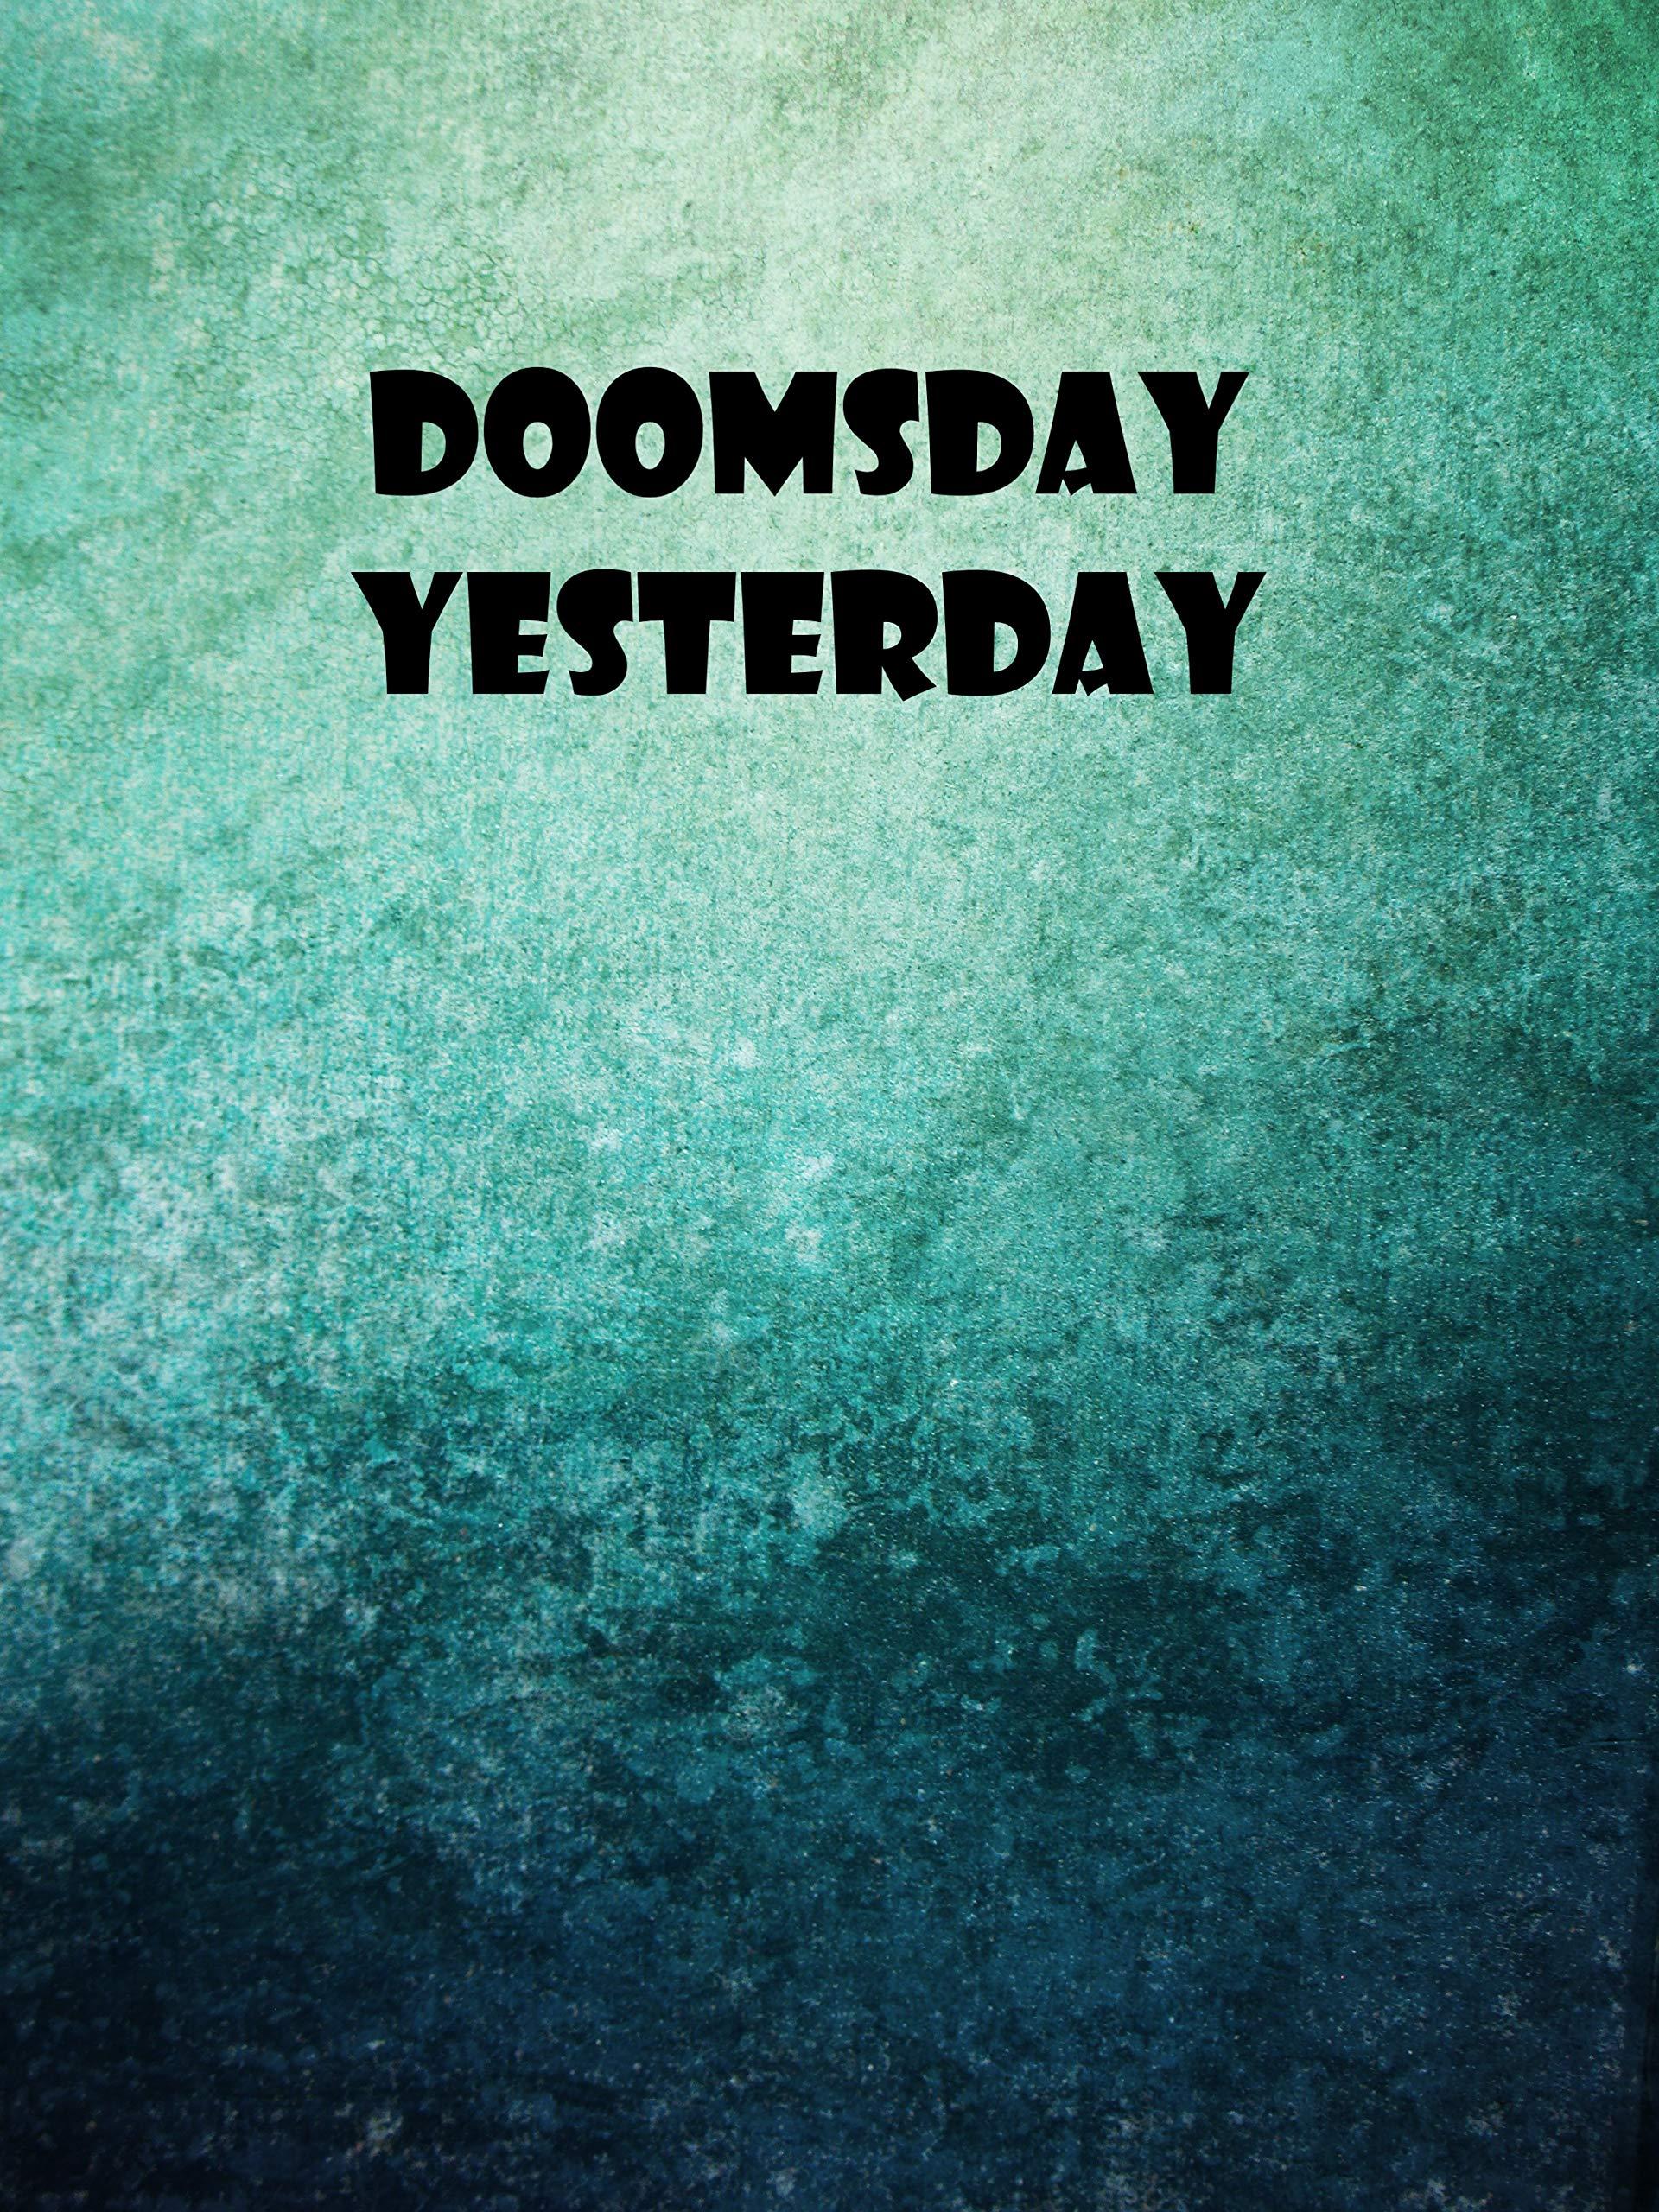 Doomsday Yesterday